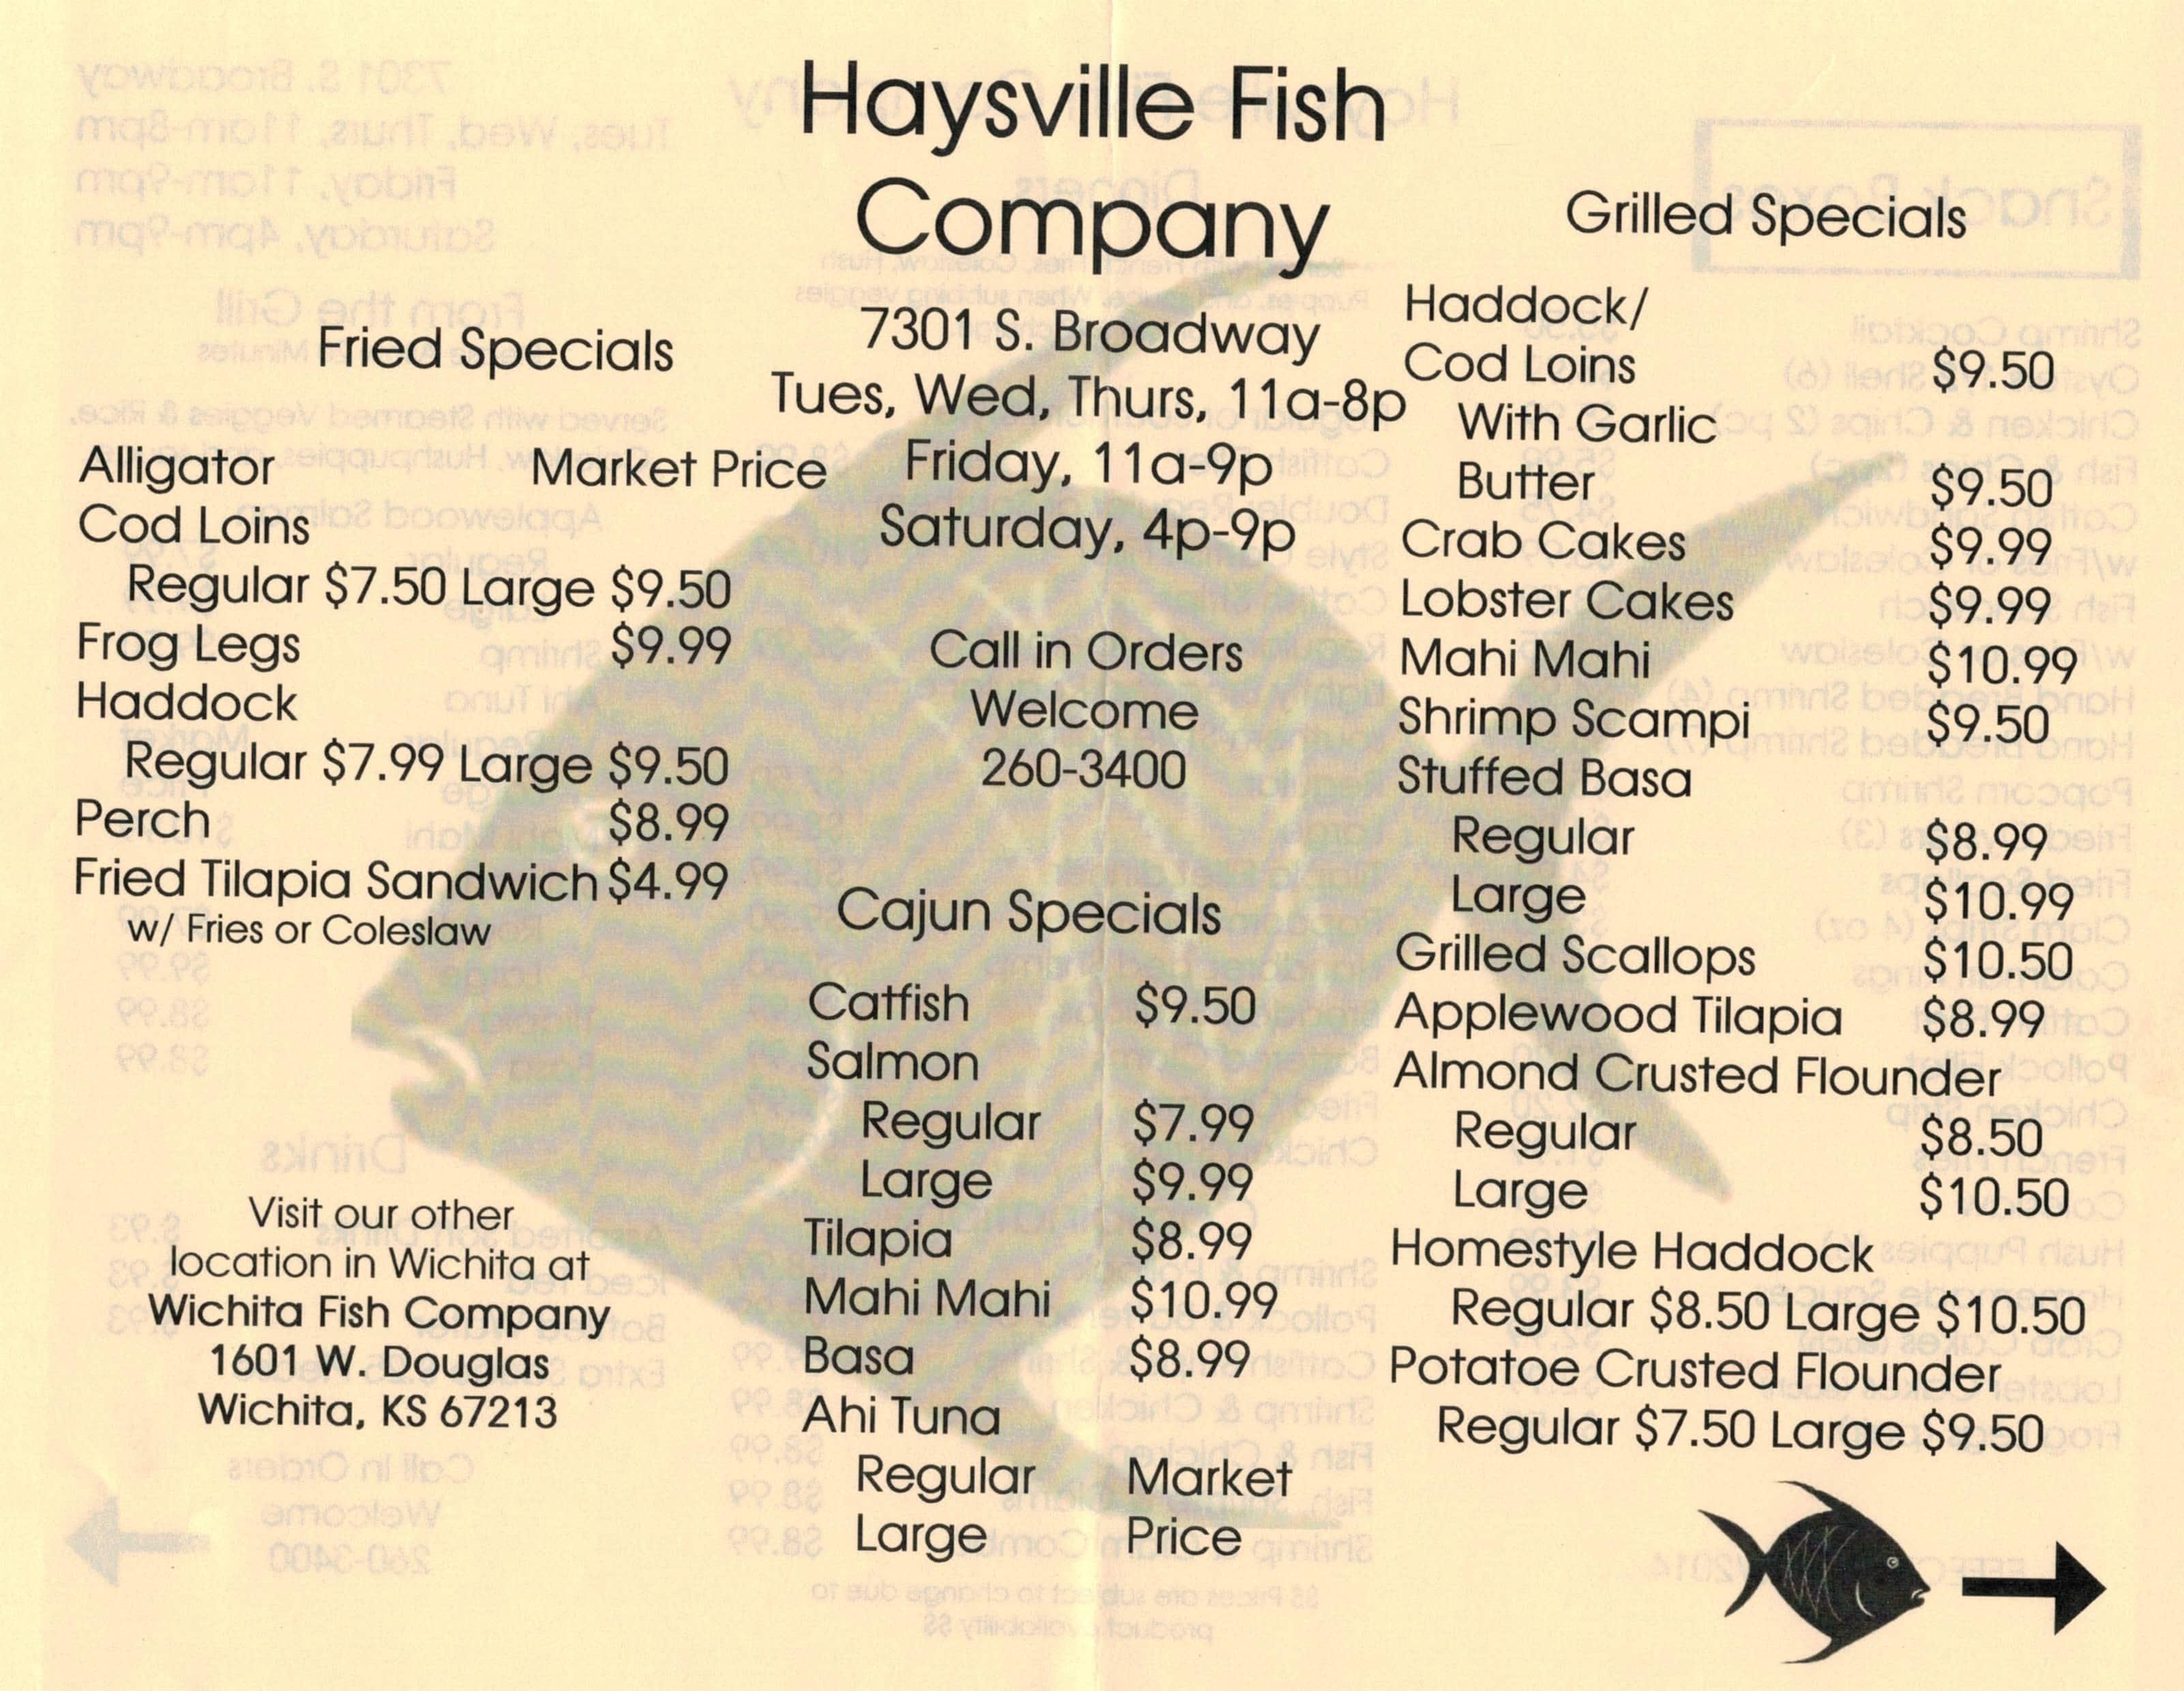 Haysville fish company